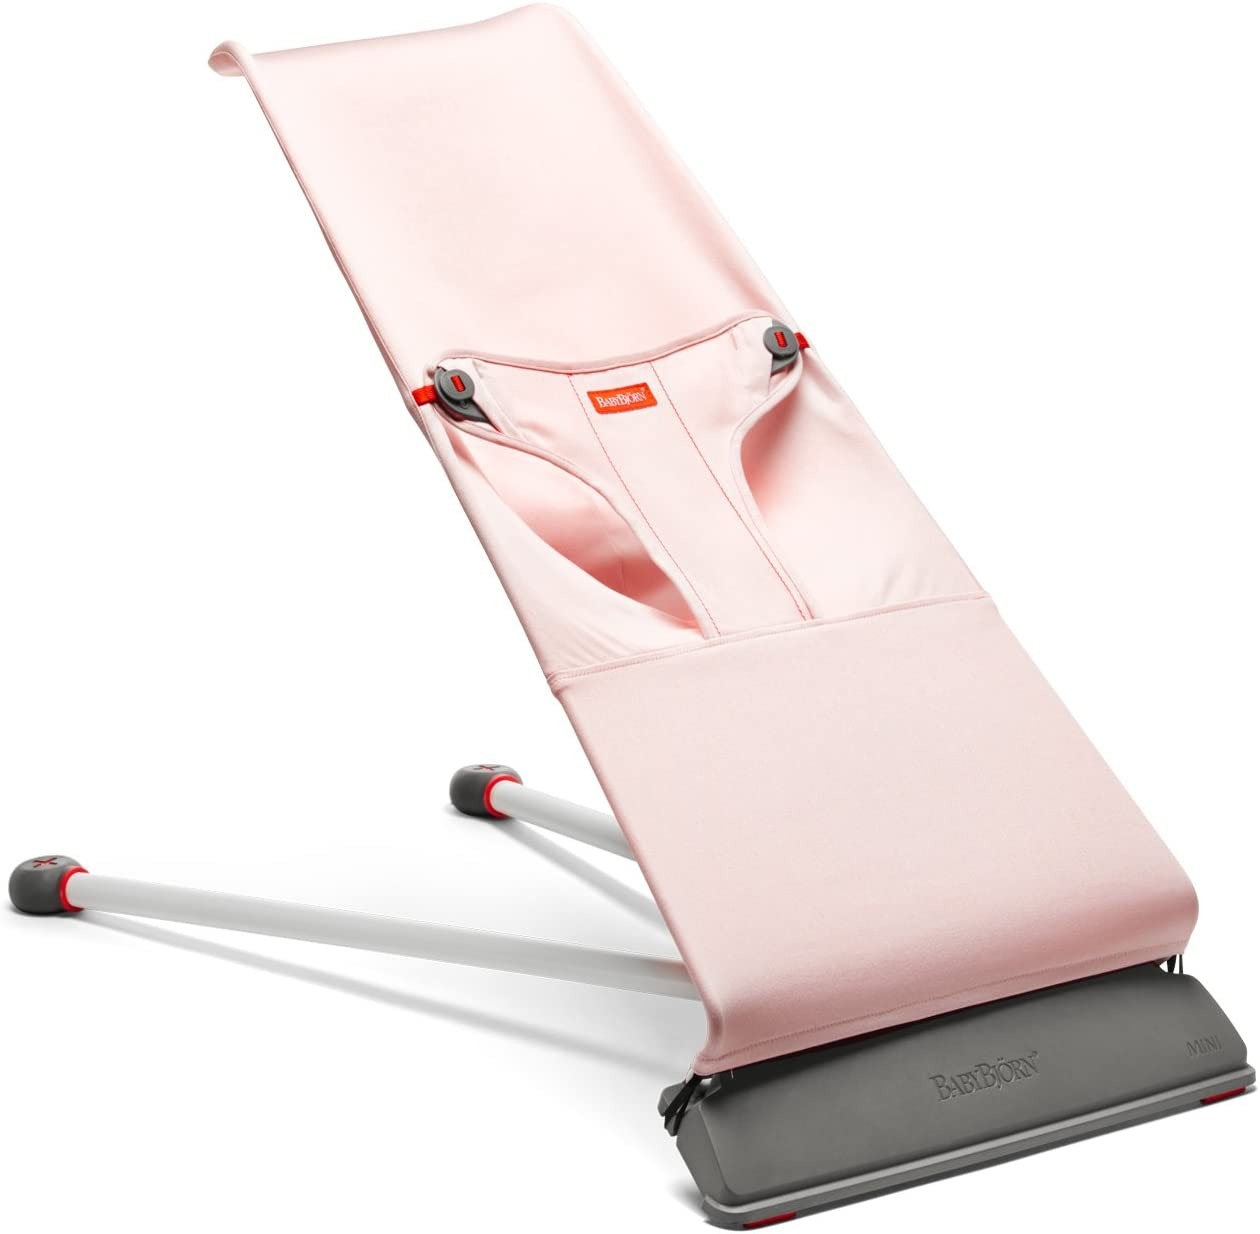 Babybjorn Bouncer Mini Light Pink Amazon Ca Baby